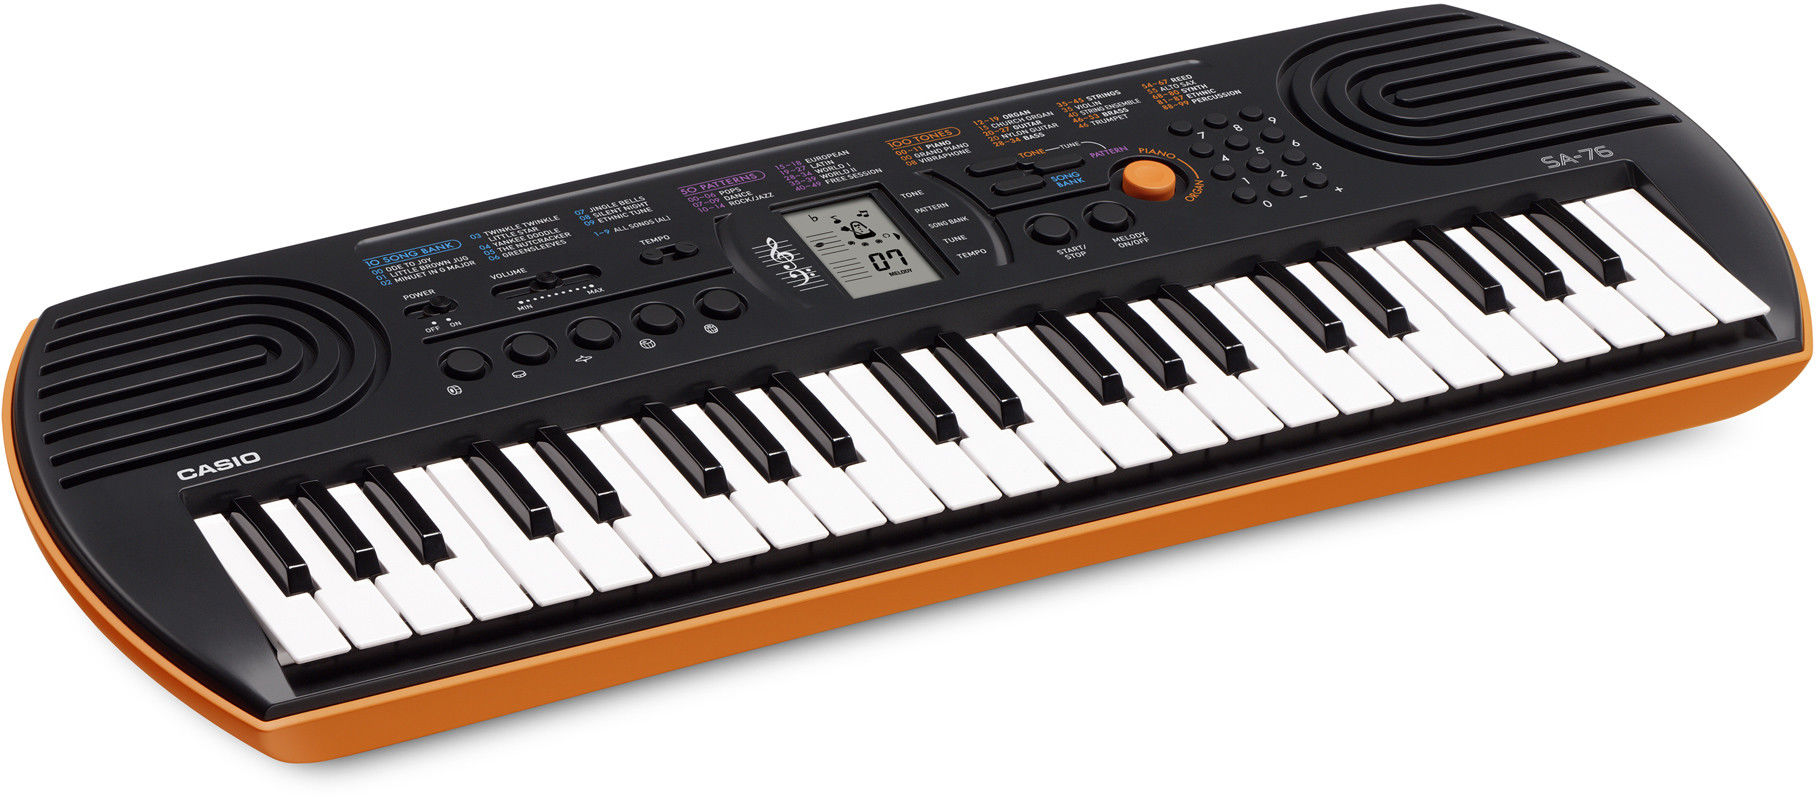 Casio SA-76 - mini keyboard + zasilacz - Raty 30x0%!